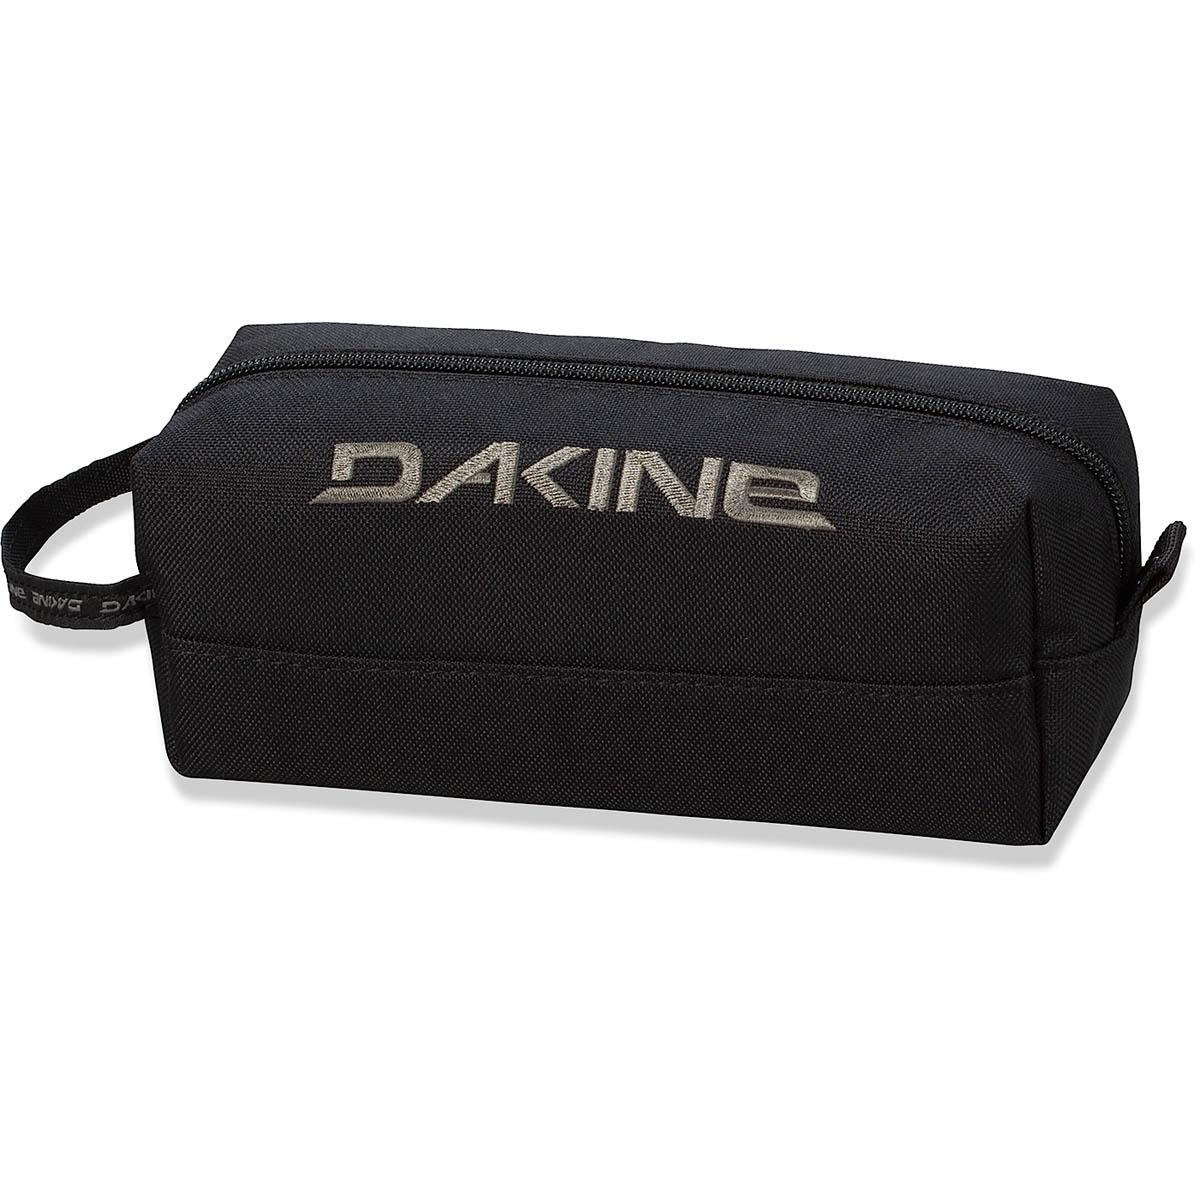 577f2f8fe2250 Dakine Accessory Case Federmäppchen Black